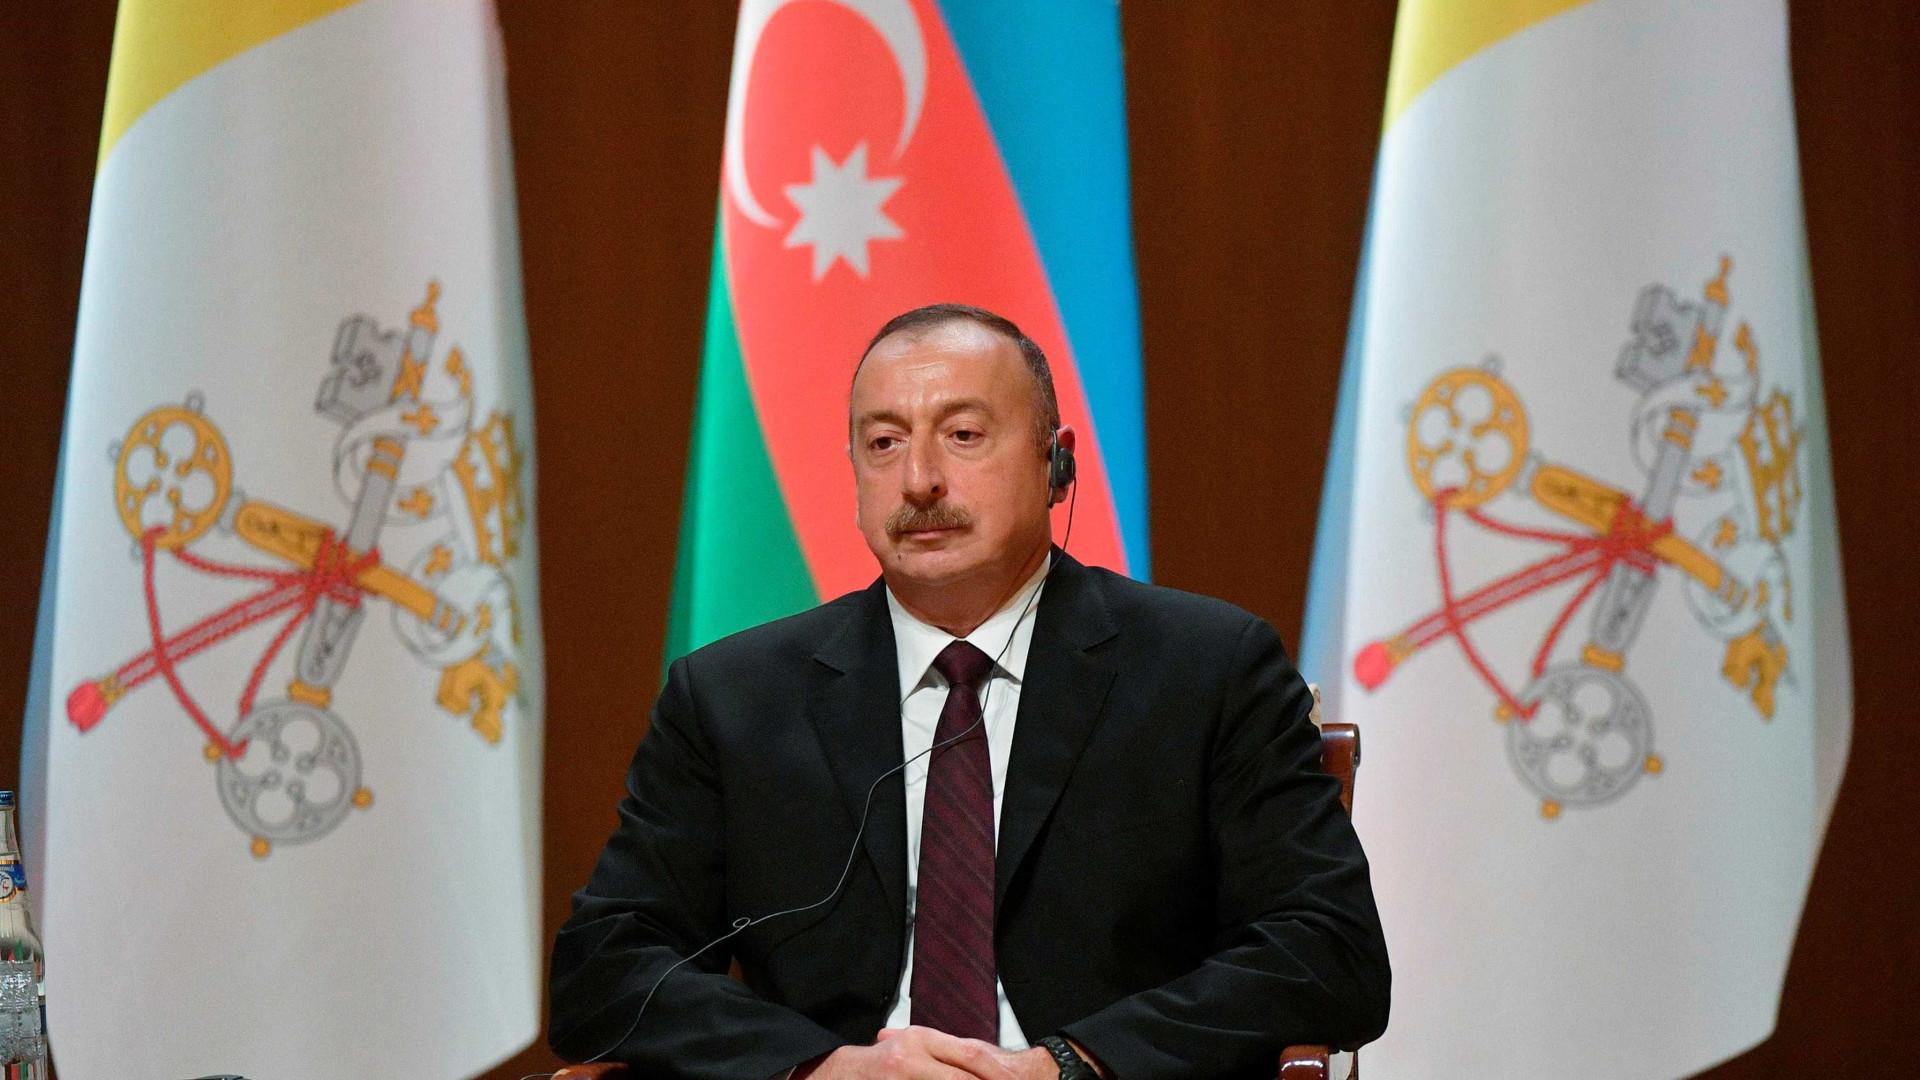 Difamar presidente do Azerbeijão online vira crime